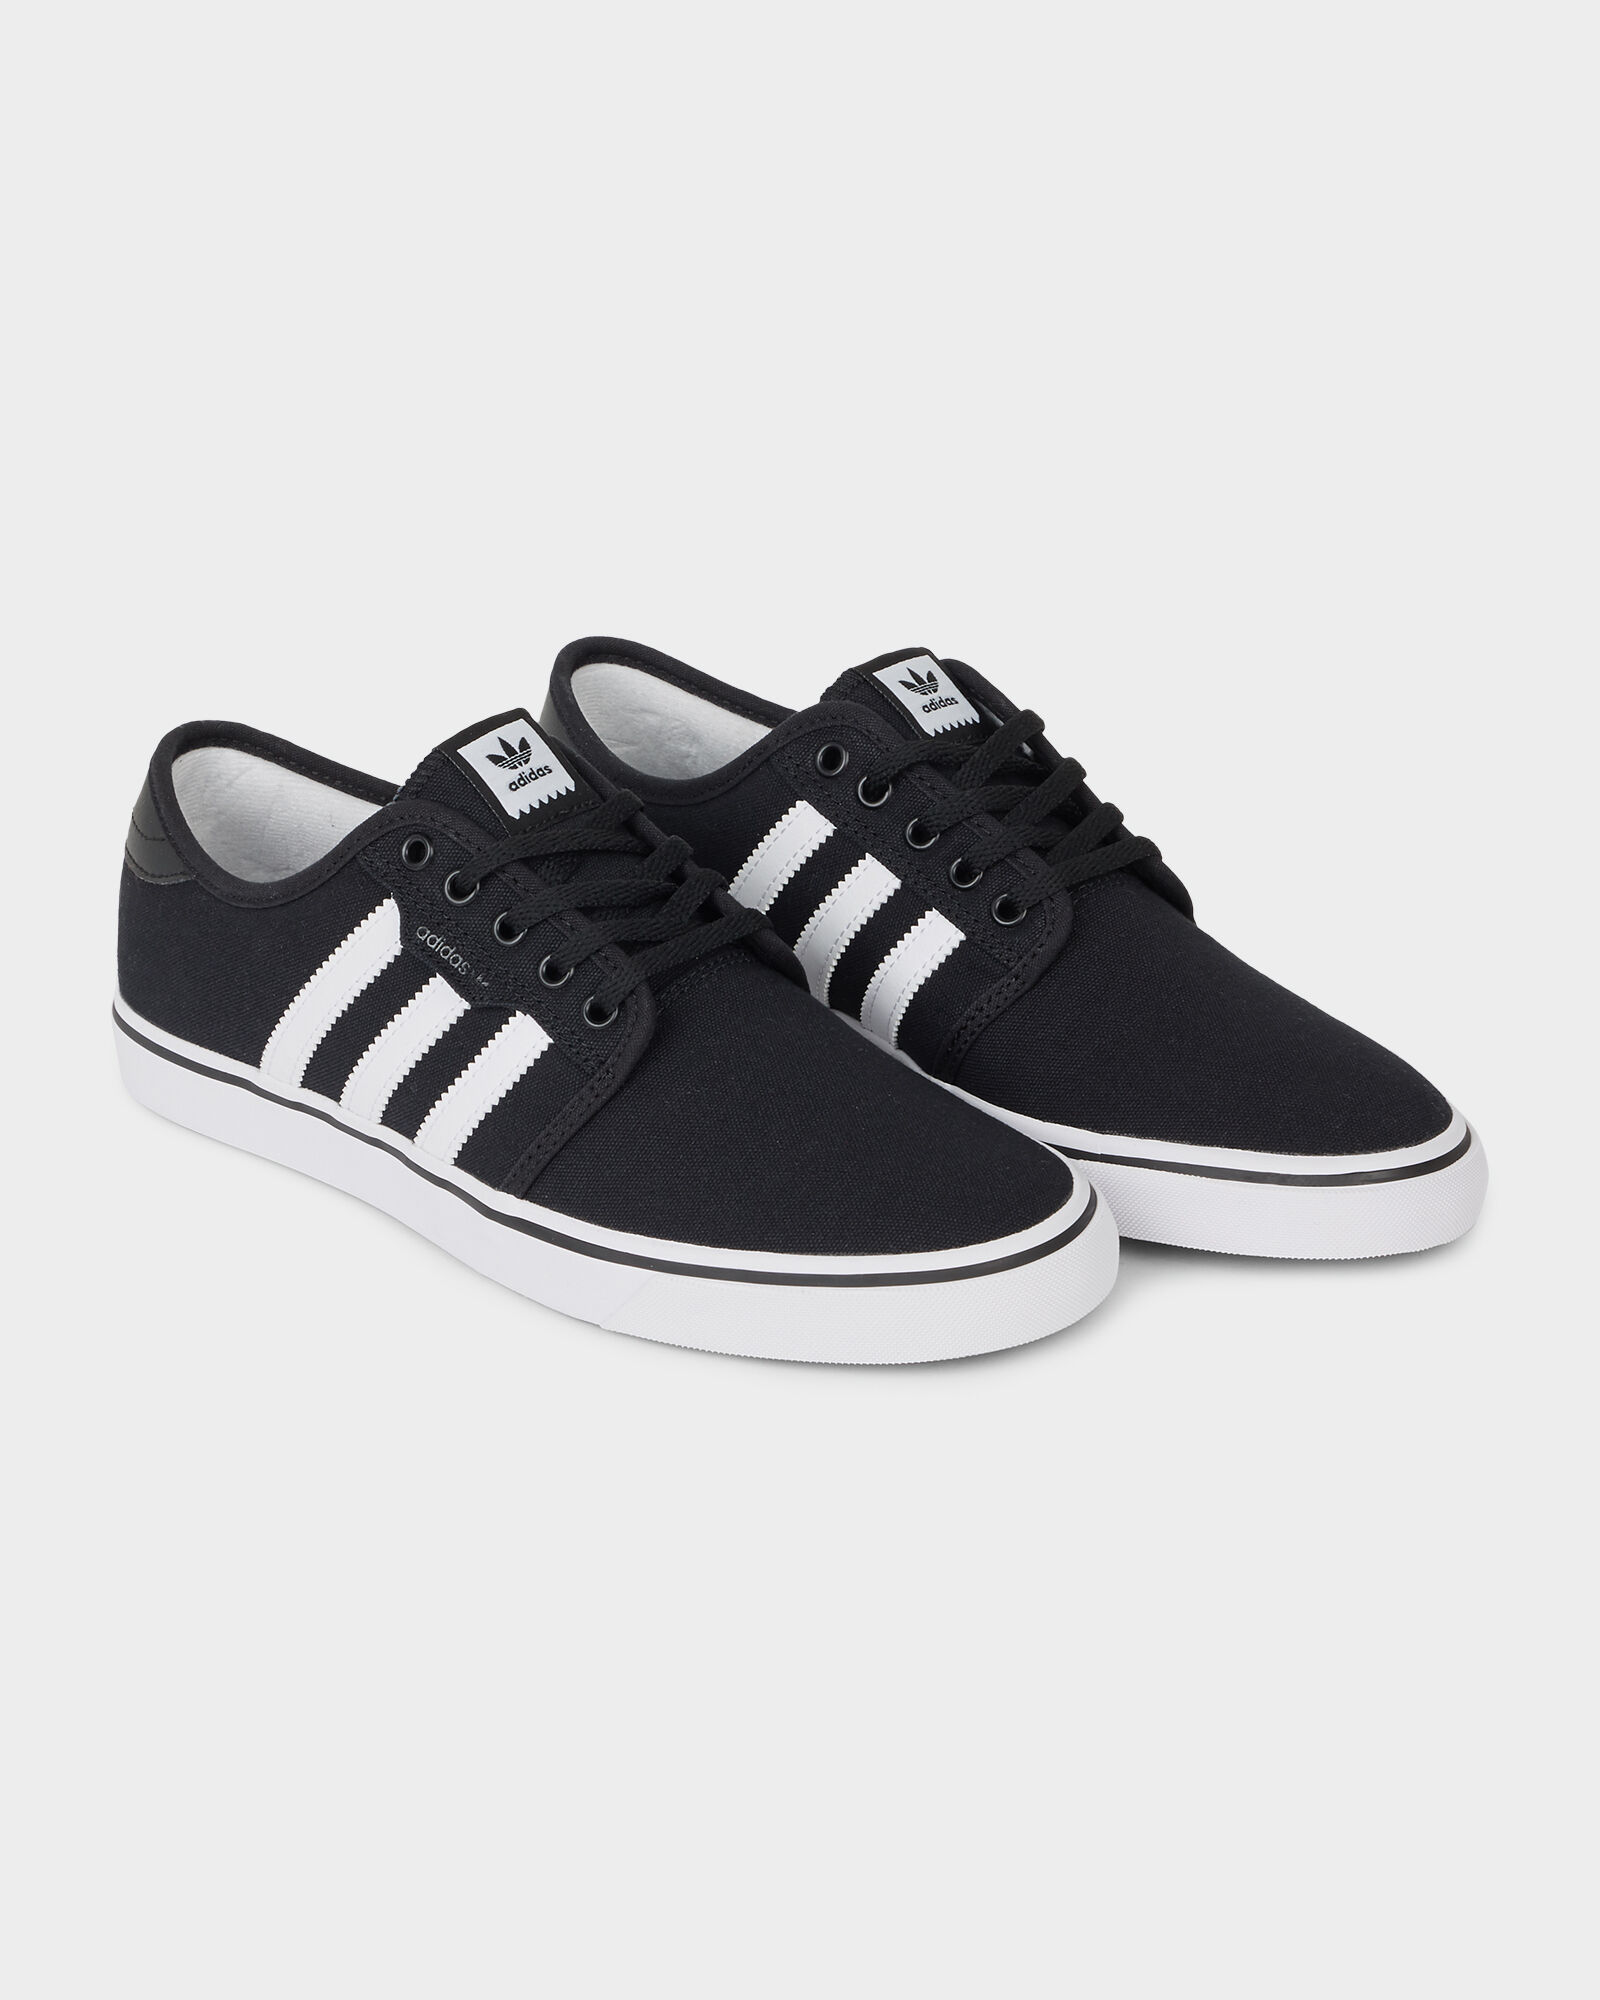 adidas Seeley Grey, Black, & White Shoes